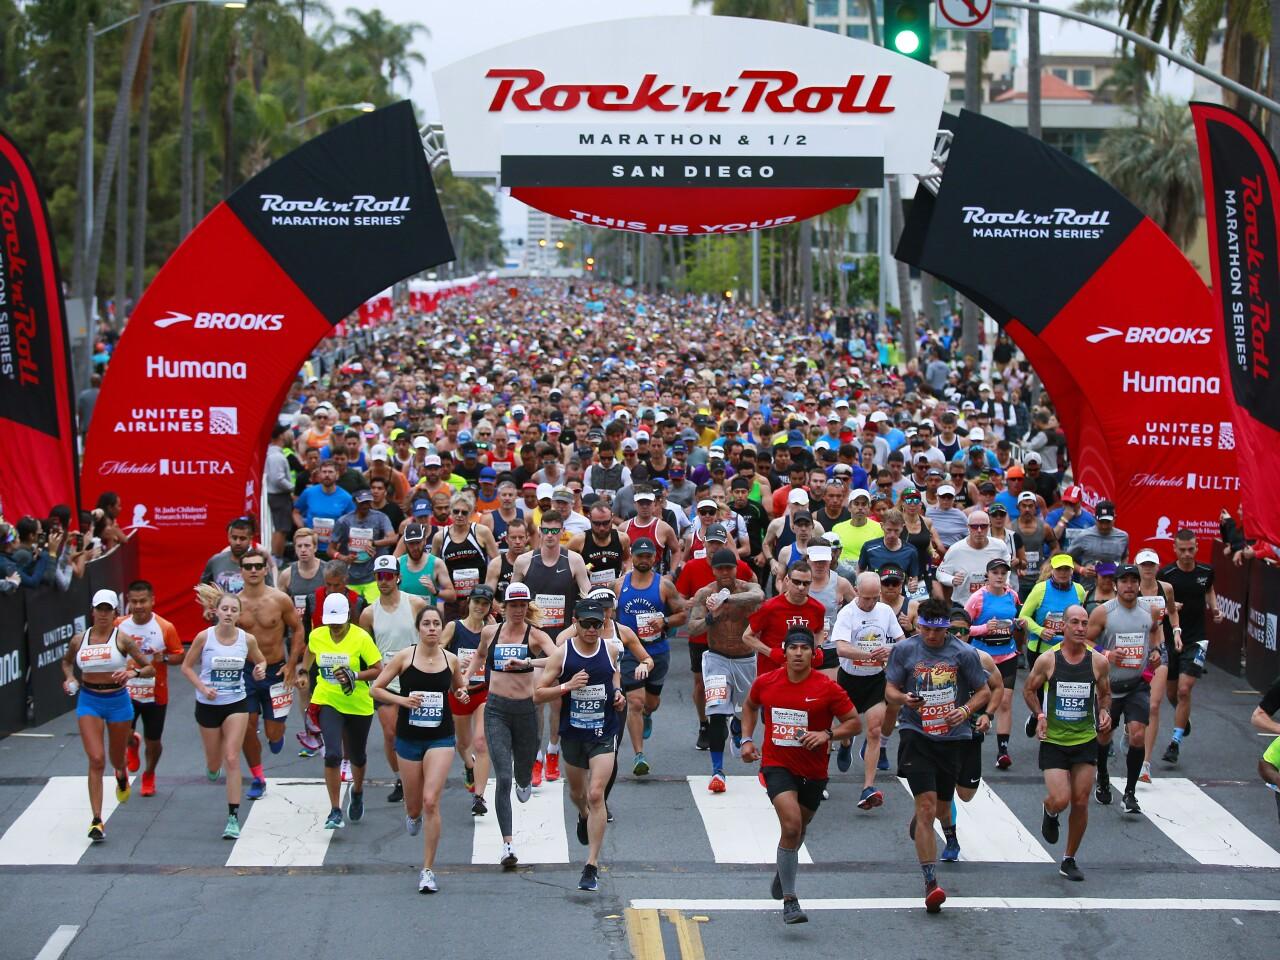 Runners start the Rock 'n' Marathon and Half Marathon along 6th Ave. near Balboa Park in San Diego on June 2, 2019.